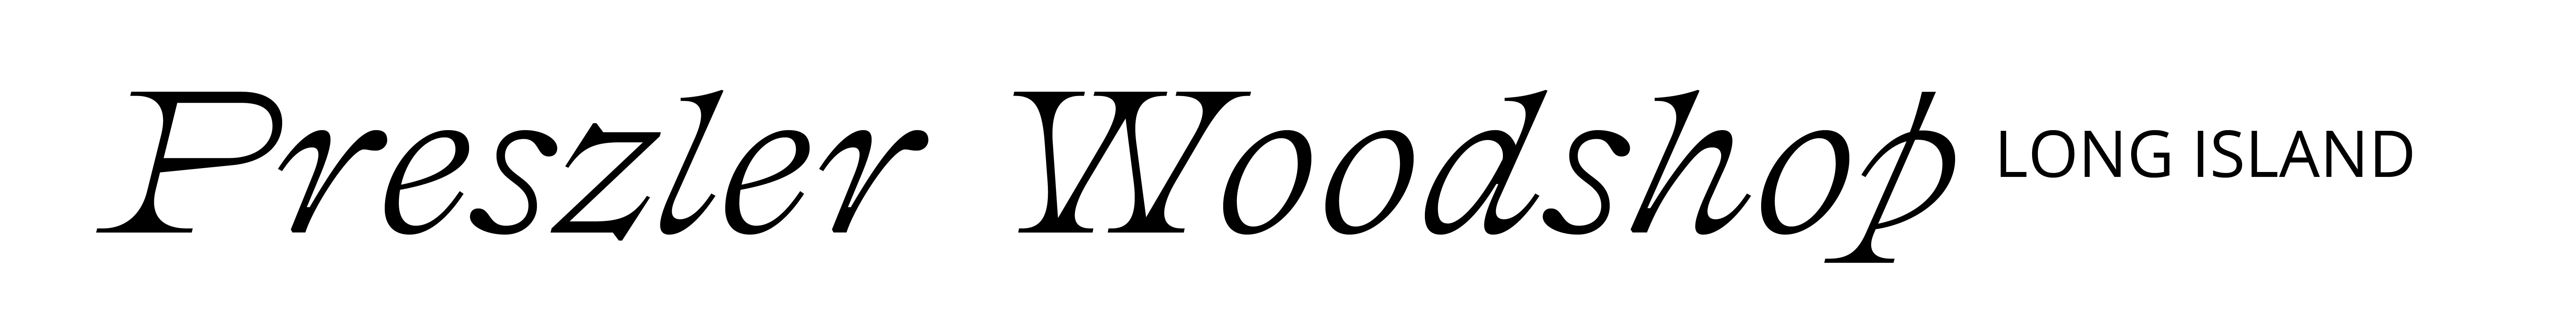 Prezler Woodshop